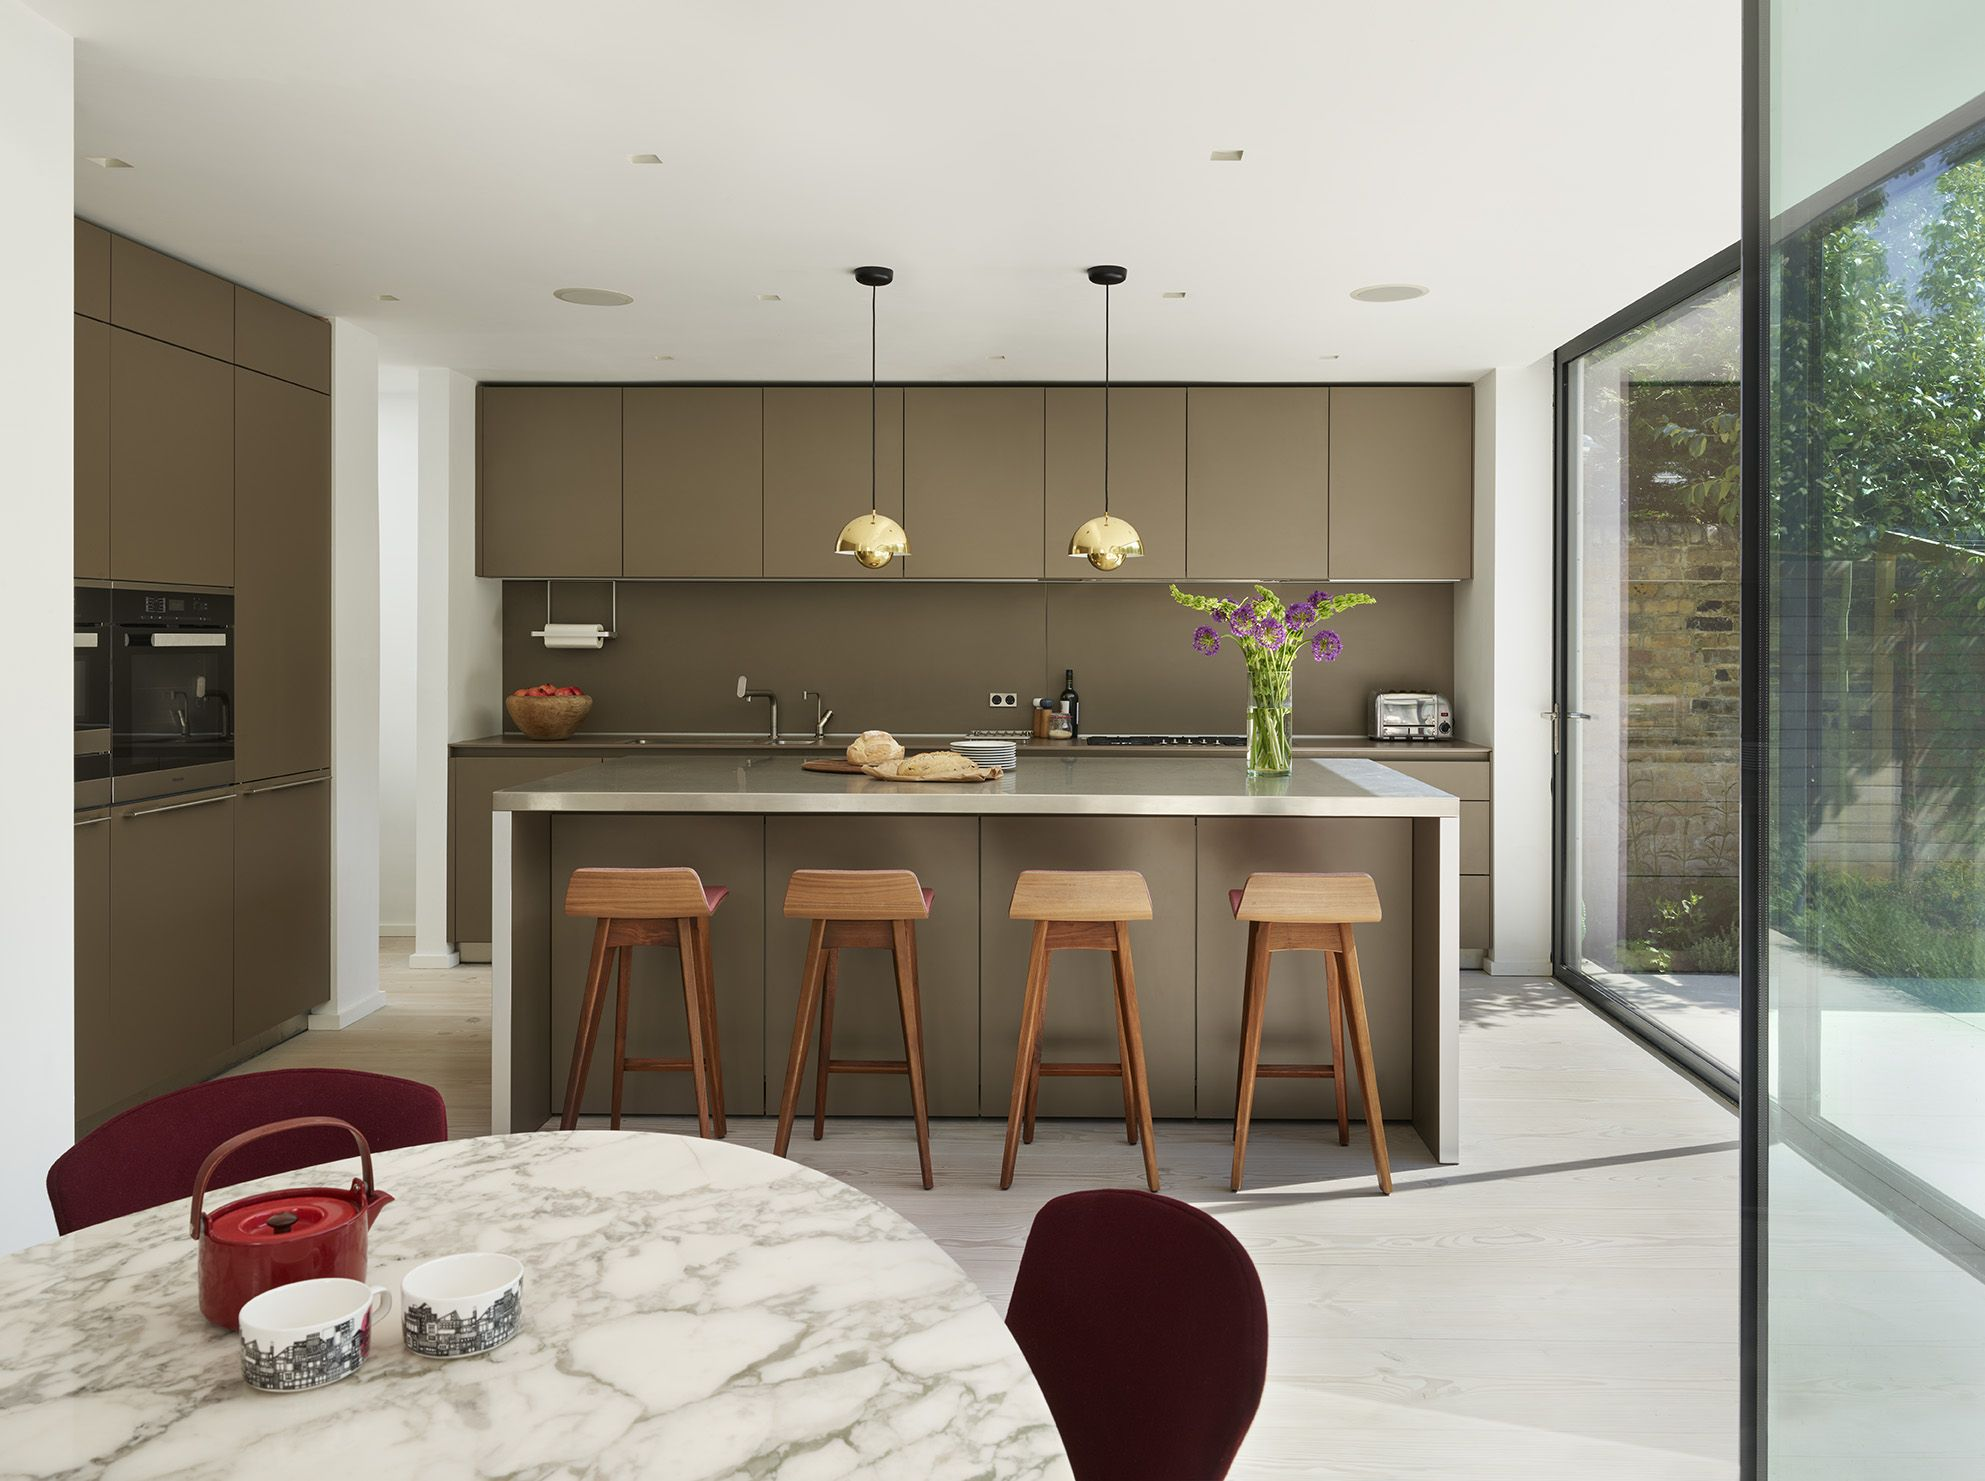 Kitchen Architecture bulthaup Design classic Design